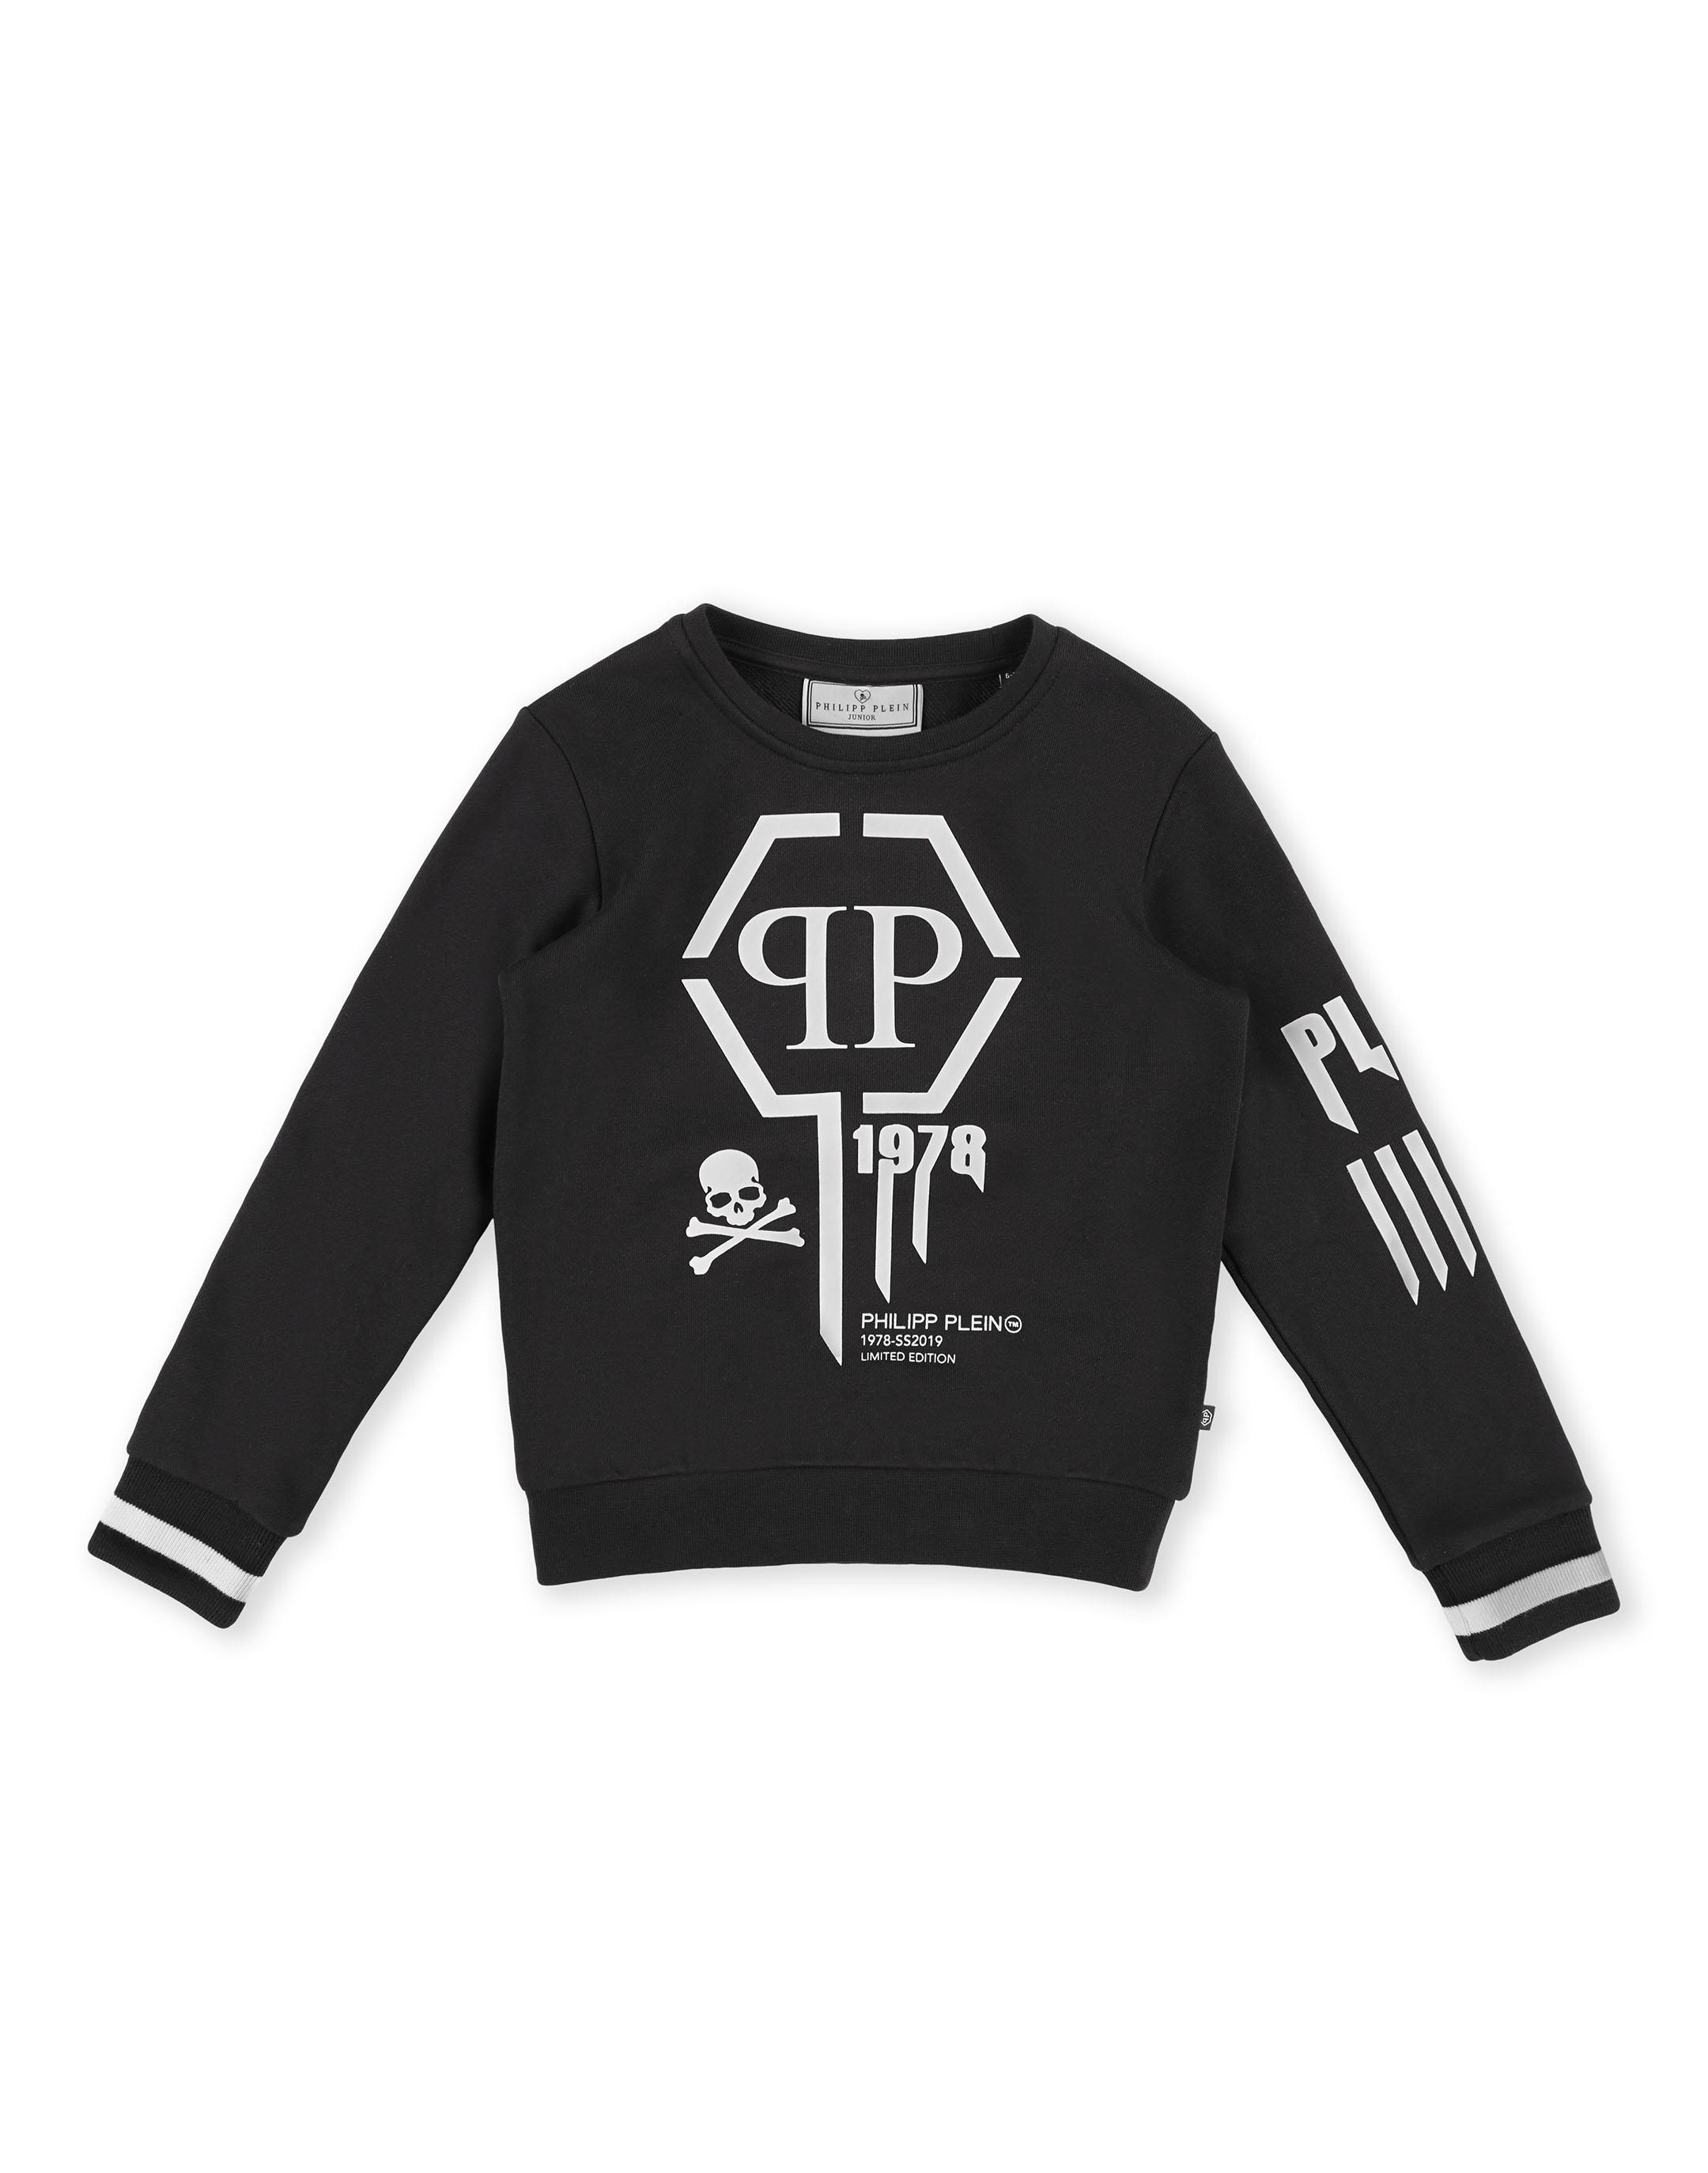 9a43eeacae Sweatshirt LS Philipp Plein TM